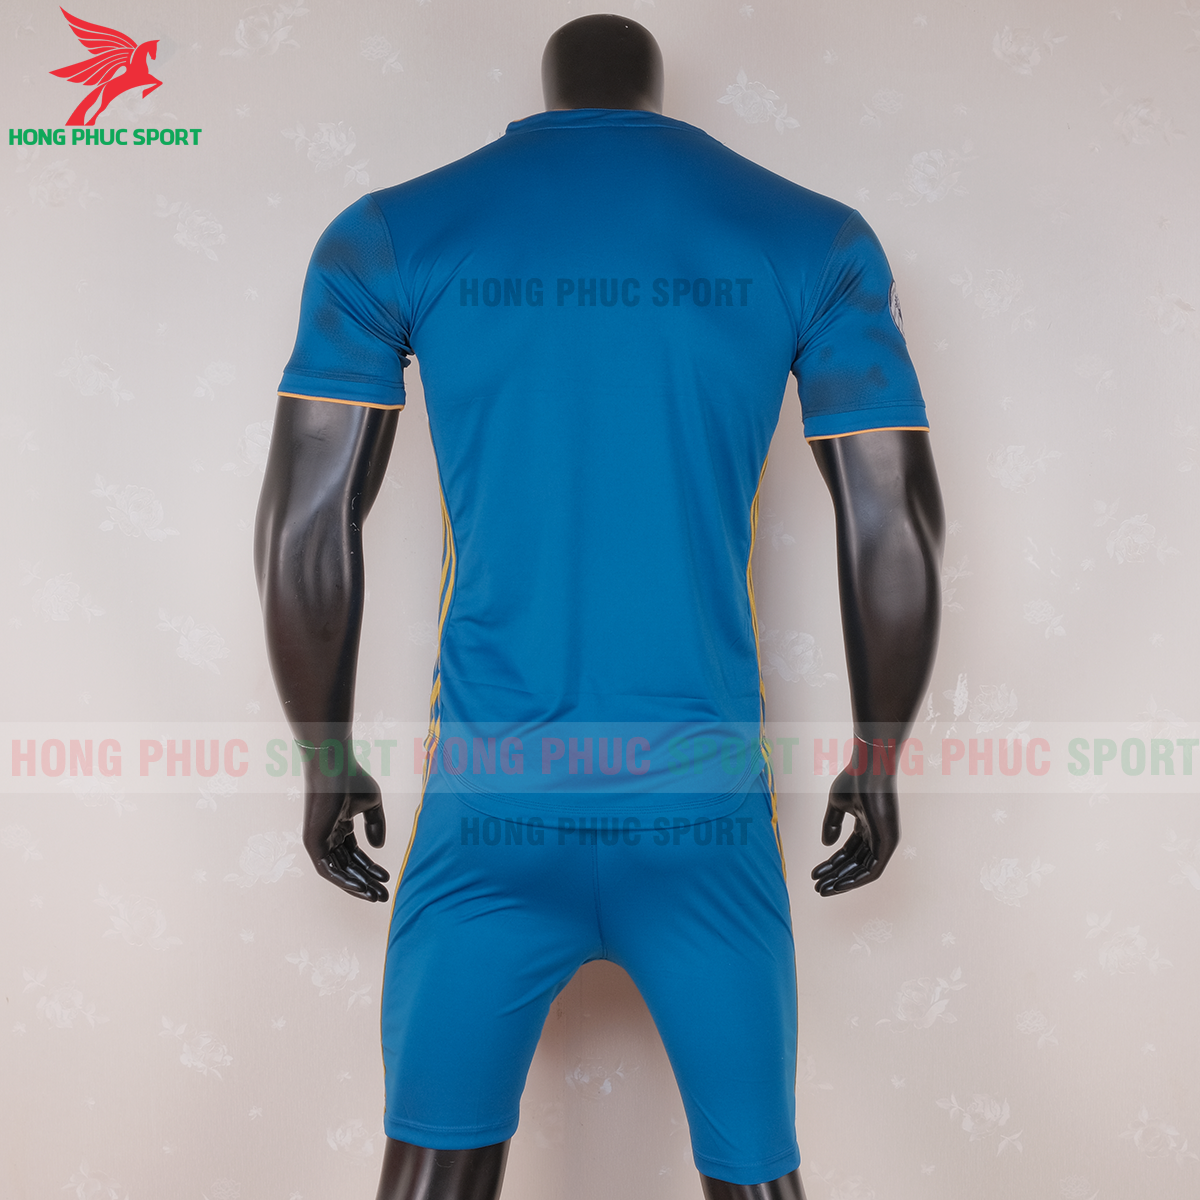 https://cdn.hongphucsport.com/unsafe/s4.shopbay.vn/files/285/ao-bong-da-arsenal-2020-2021-mau-thu-3-6-5f6b097d278b9.png